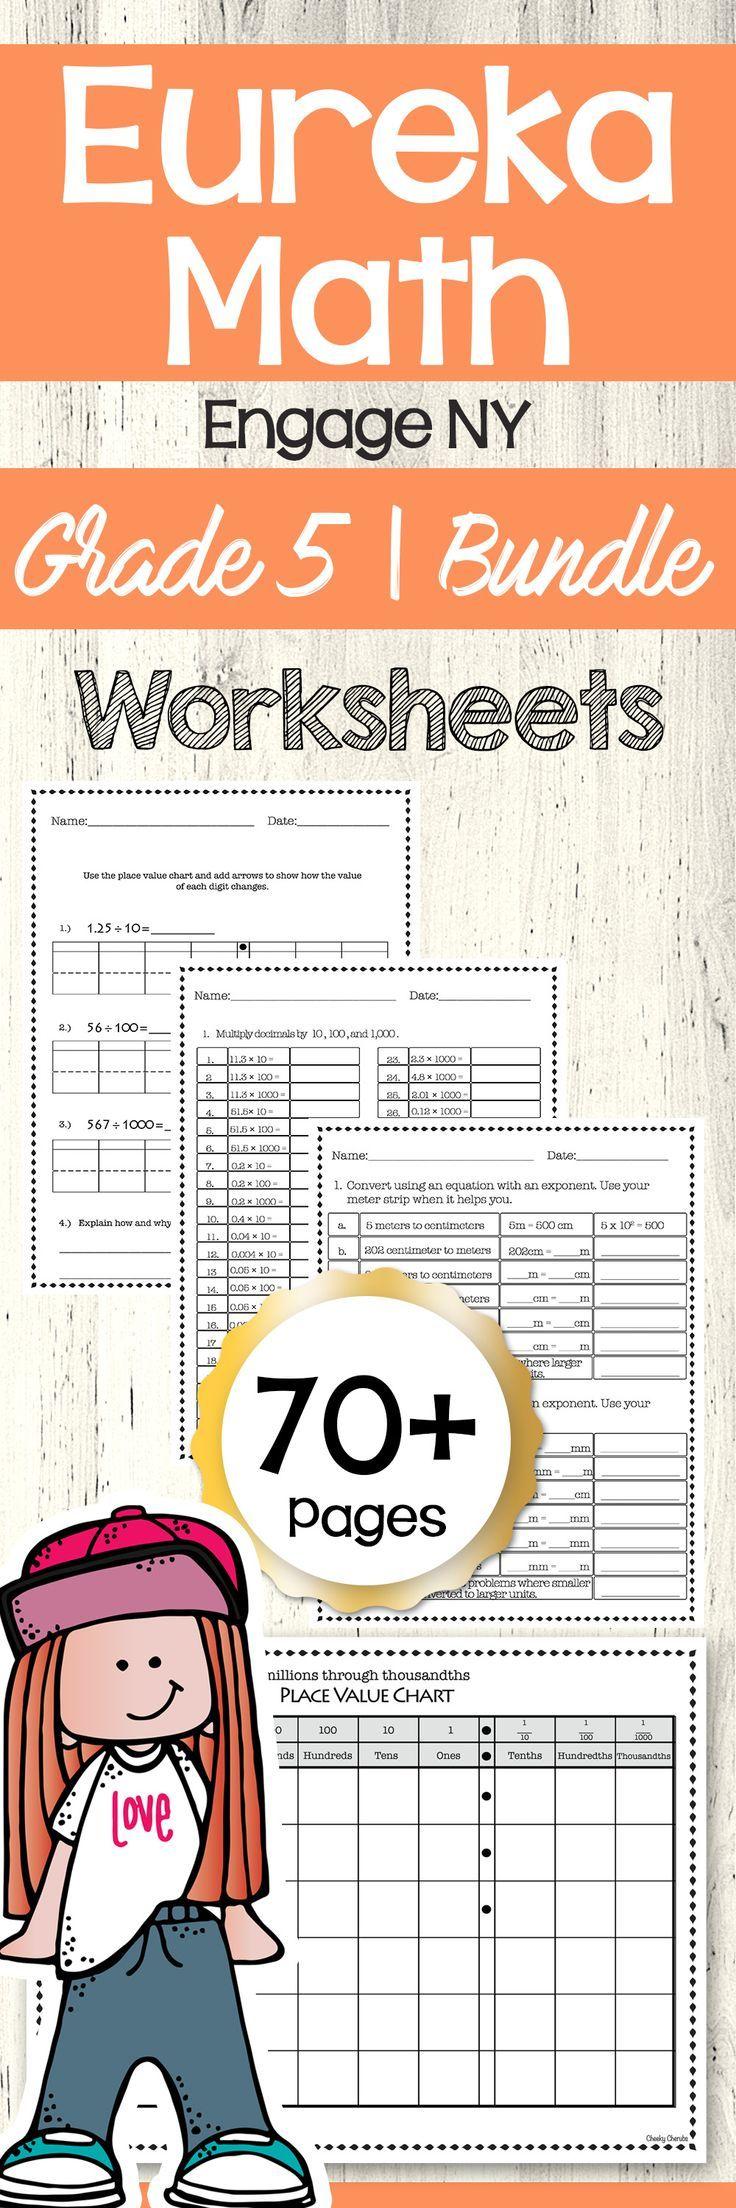 Eureka Math Engage Ny 5th Grade Worksheets All Modules Bundle In 2020 Eureka Math Math Math Lesson Plans [ 2208 x 736 Pixel ]